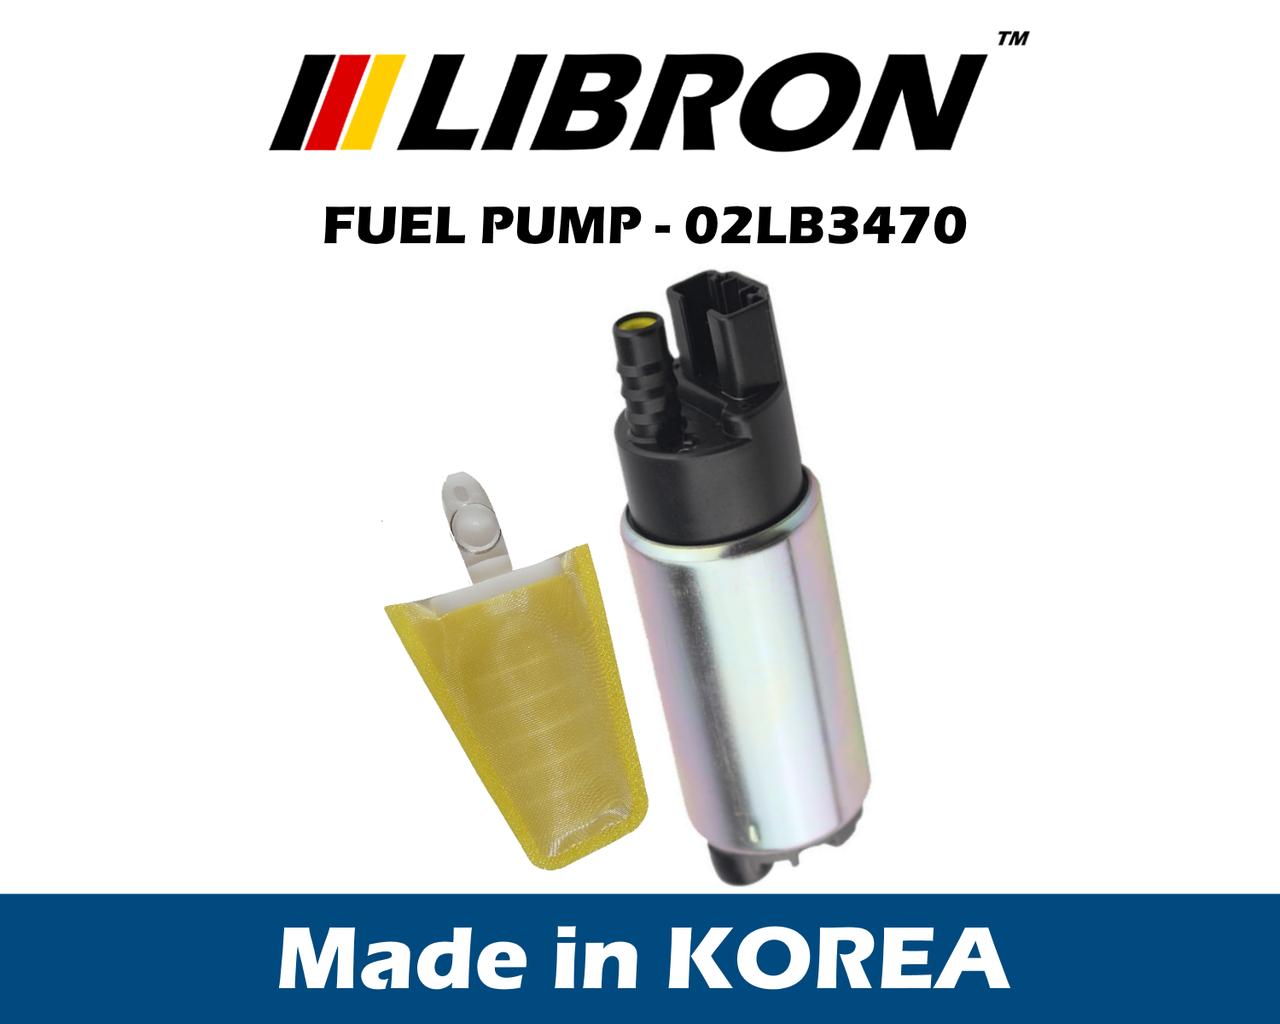 Топливный насос LIBRON 02LB3470 - MITSUBISHI SPACE WAGON (1991-1998)